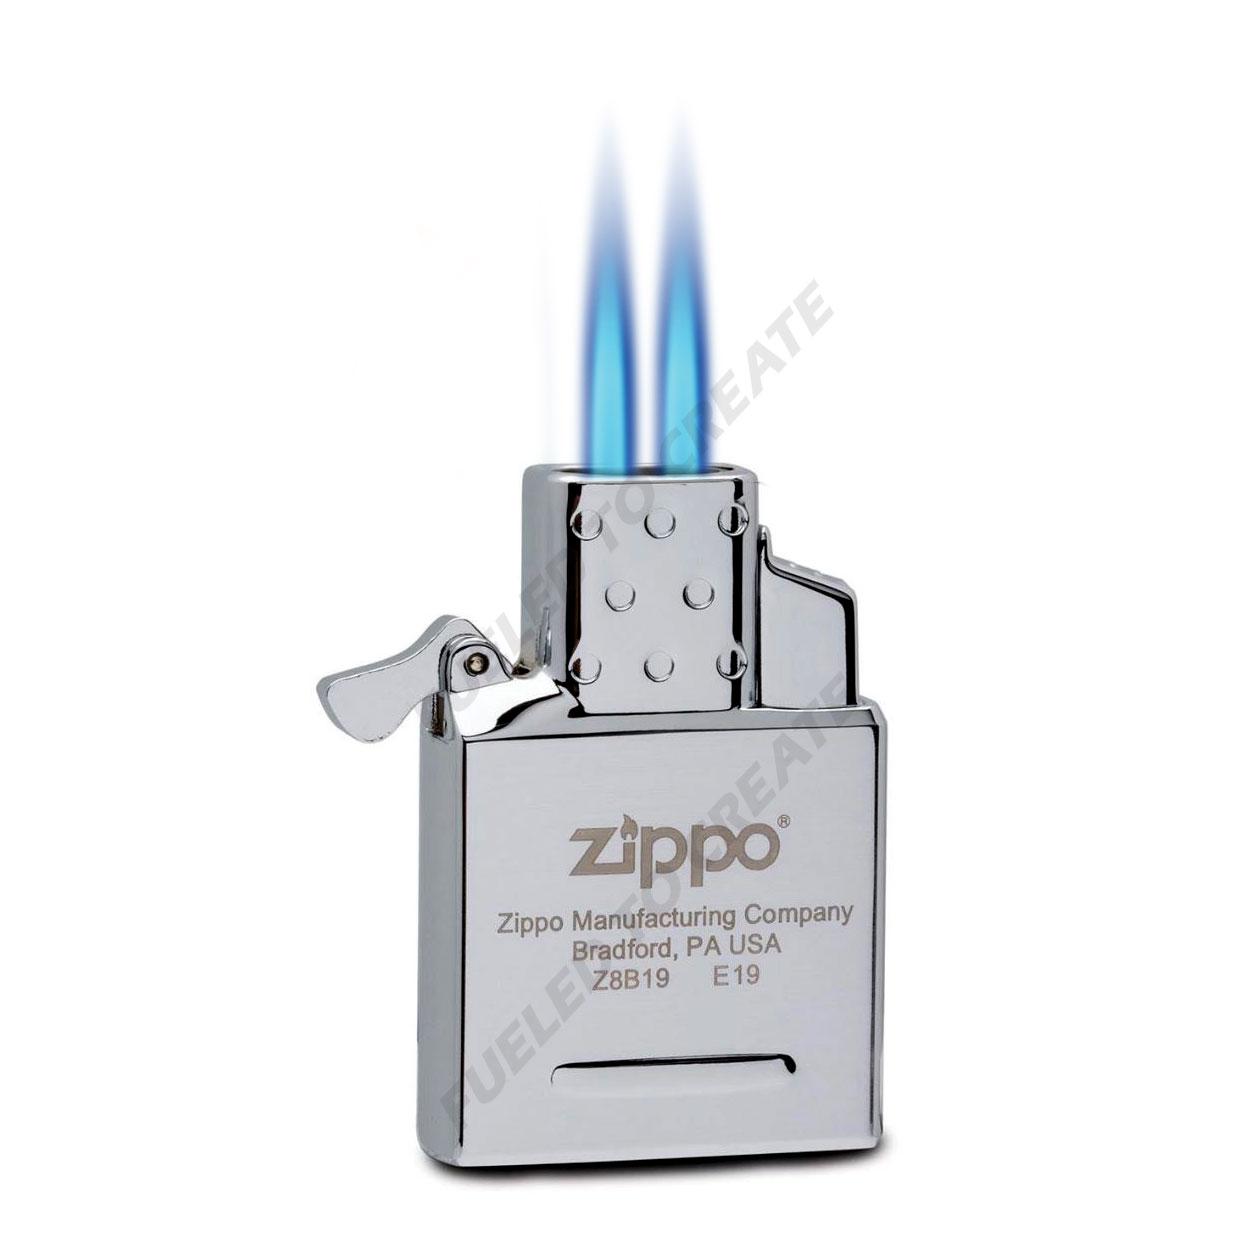 zippo dual torch two insert butane thunderbird kgm